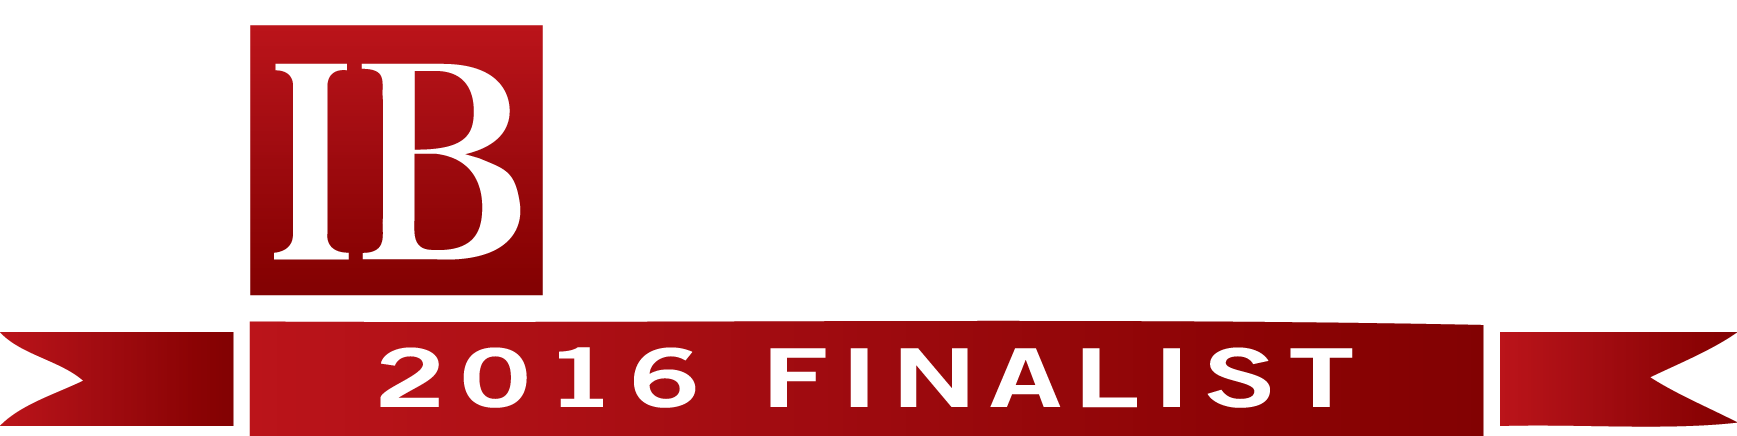 IB Executive Choice Finalist 2016